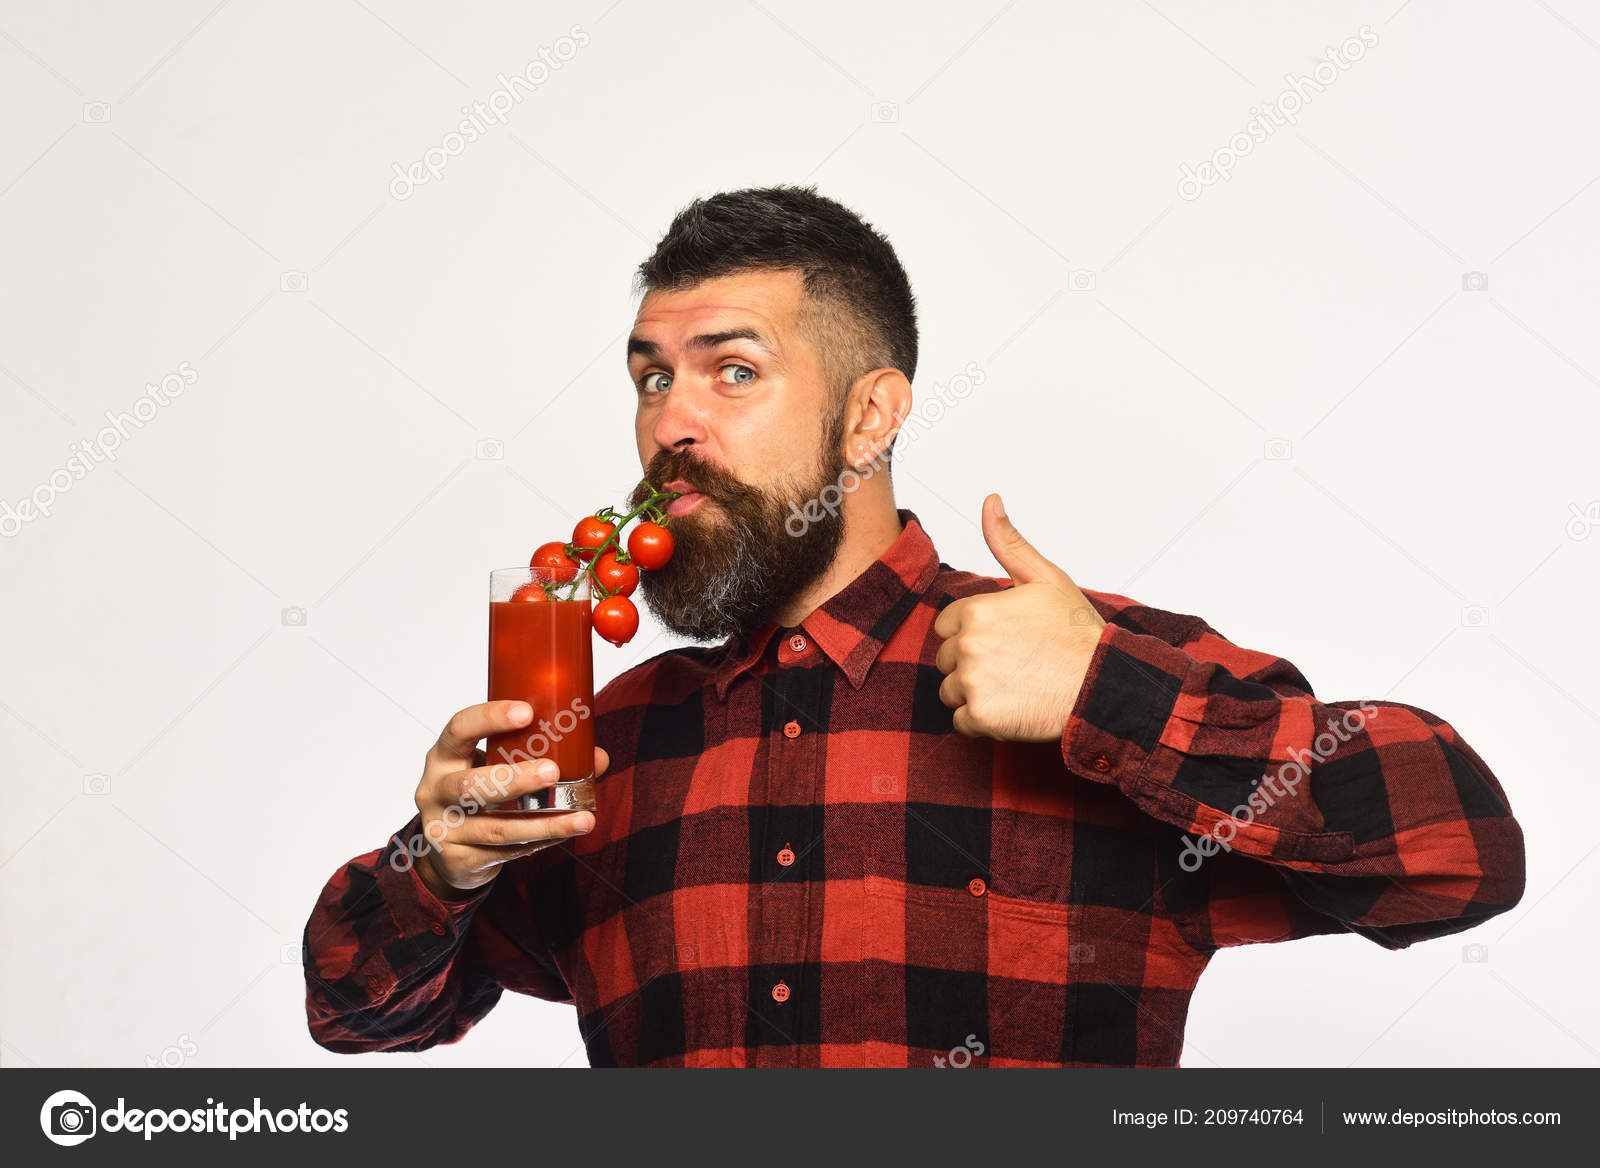 Hombre con barba bebe jugo de tomate aislado sobre fondo blanco — Foto de  Stock da38f5ffcd2